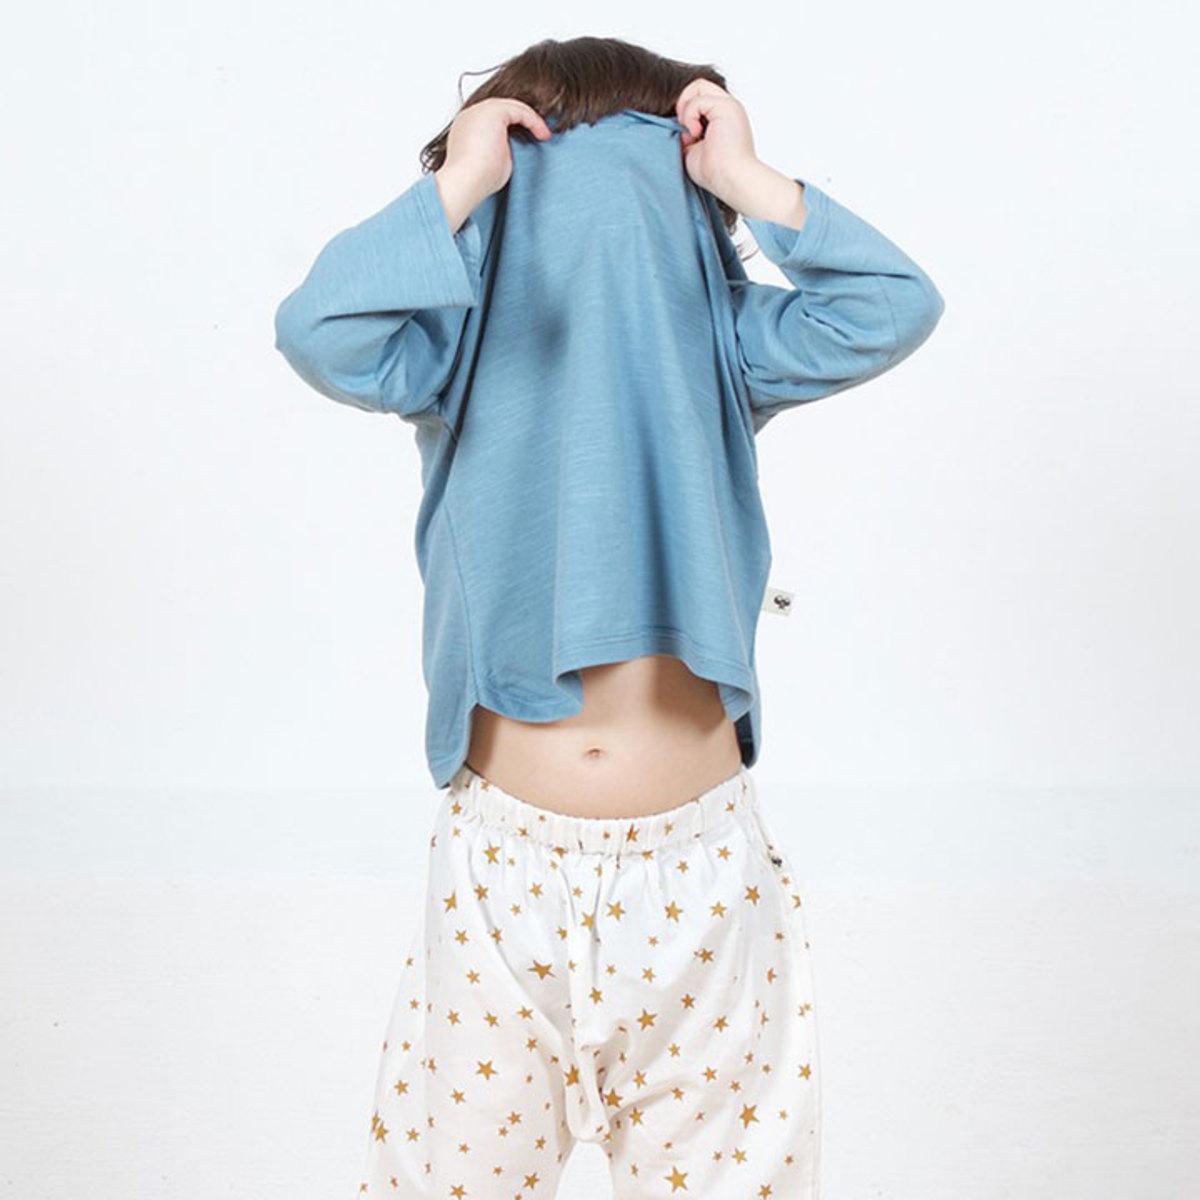 nobodinoz pyjama madras toiles moutarde 2 ans body et pyjama nobodinoz sur l 39 armoire de b b. Black Bedroom Furniture Sets. Home Design Ideas